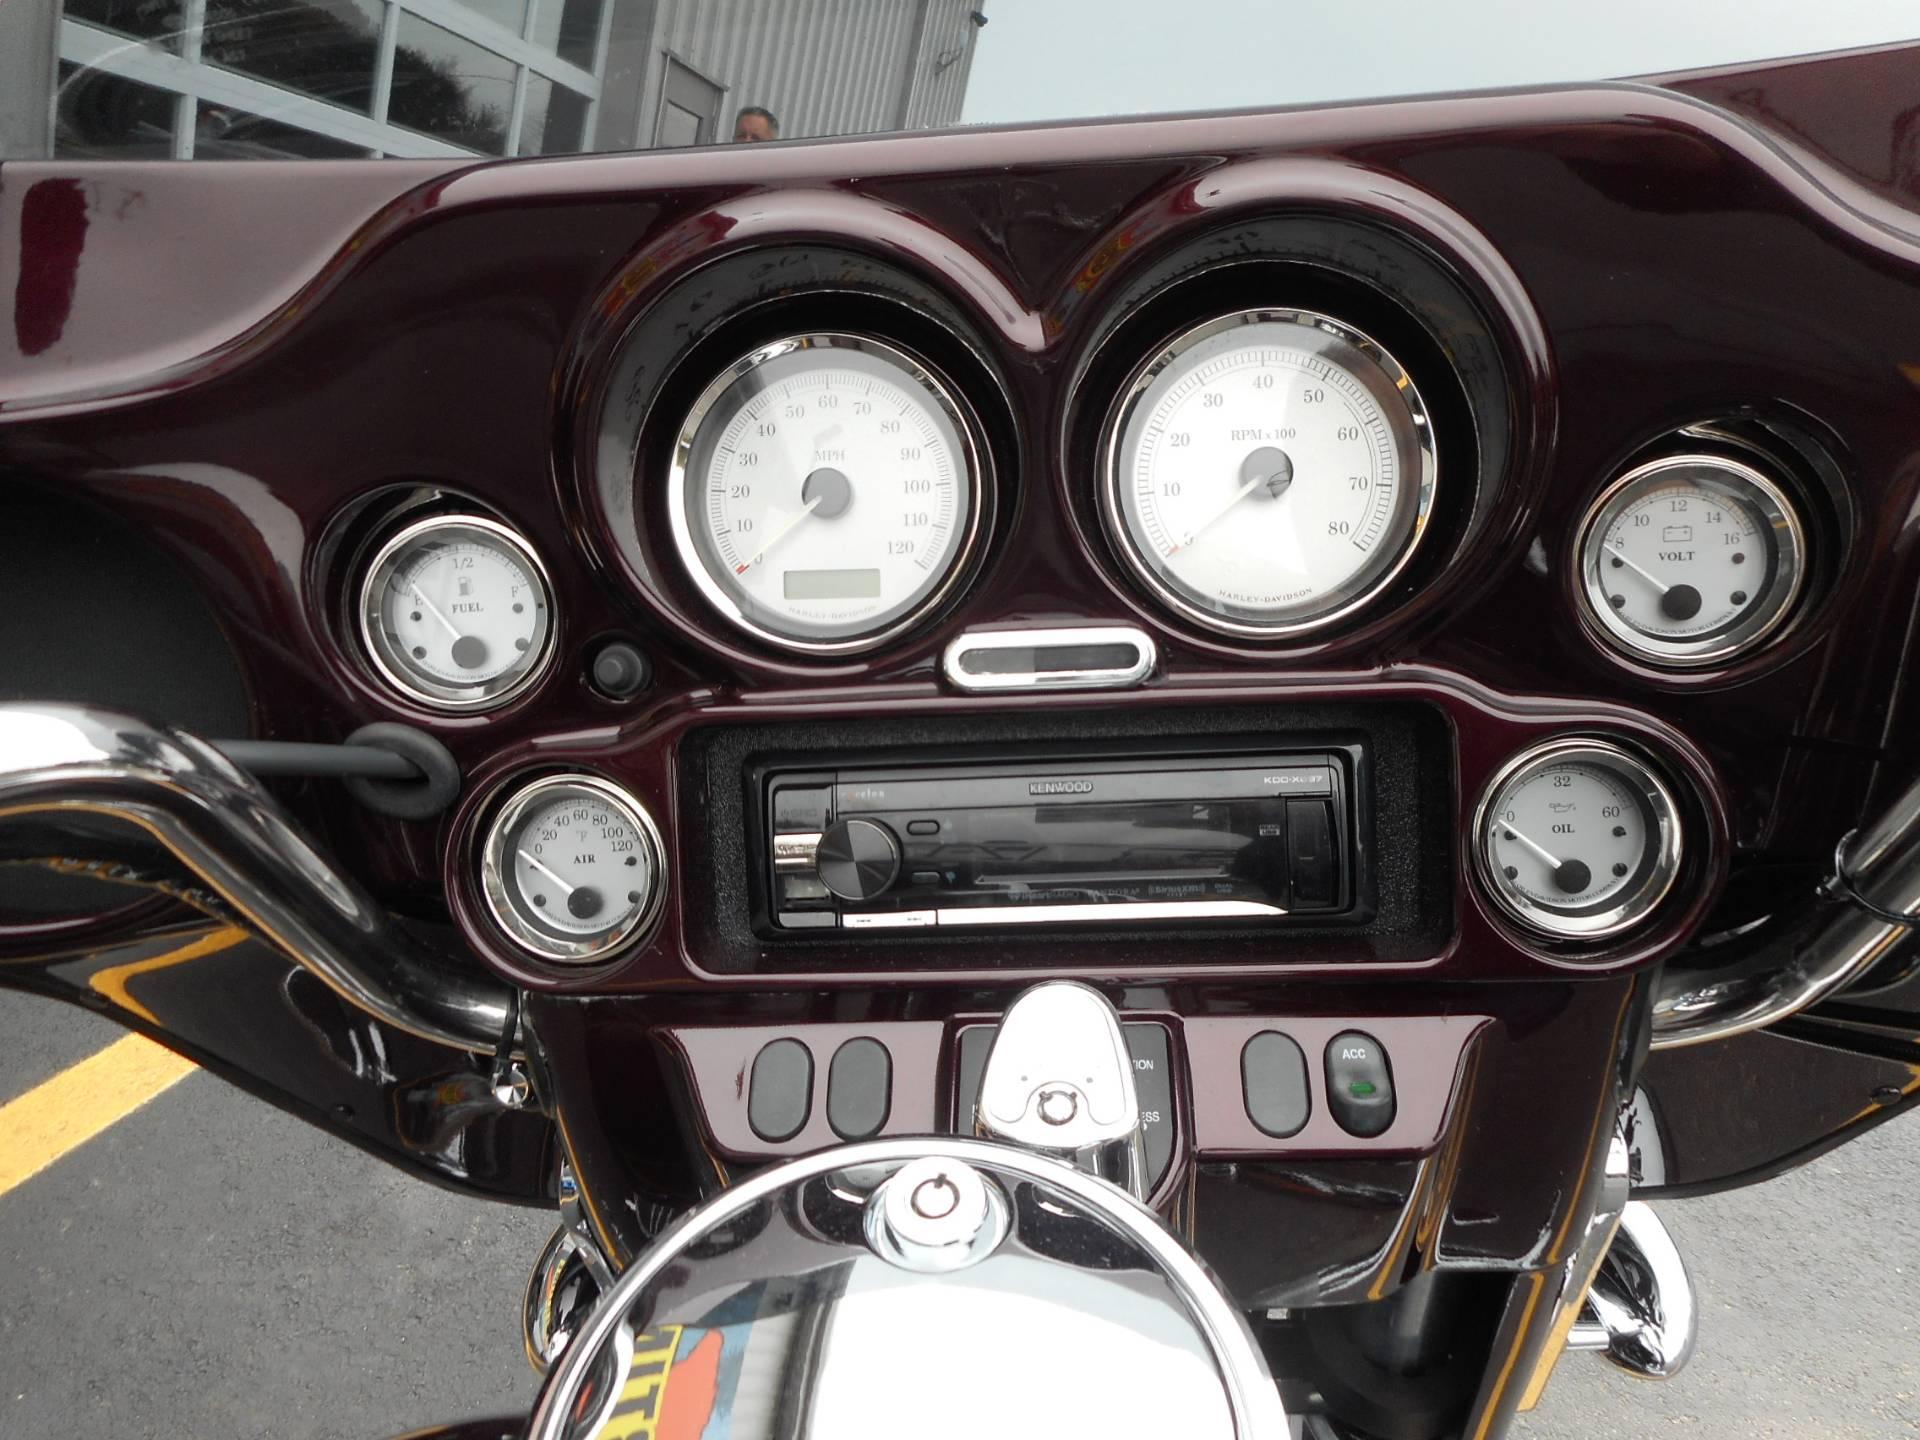 2007 Harley-Davidson FLHX Street Glide 6